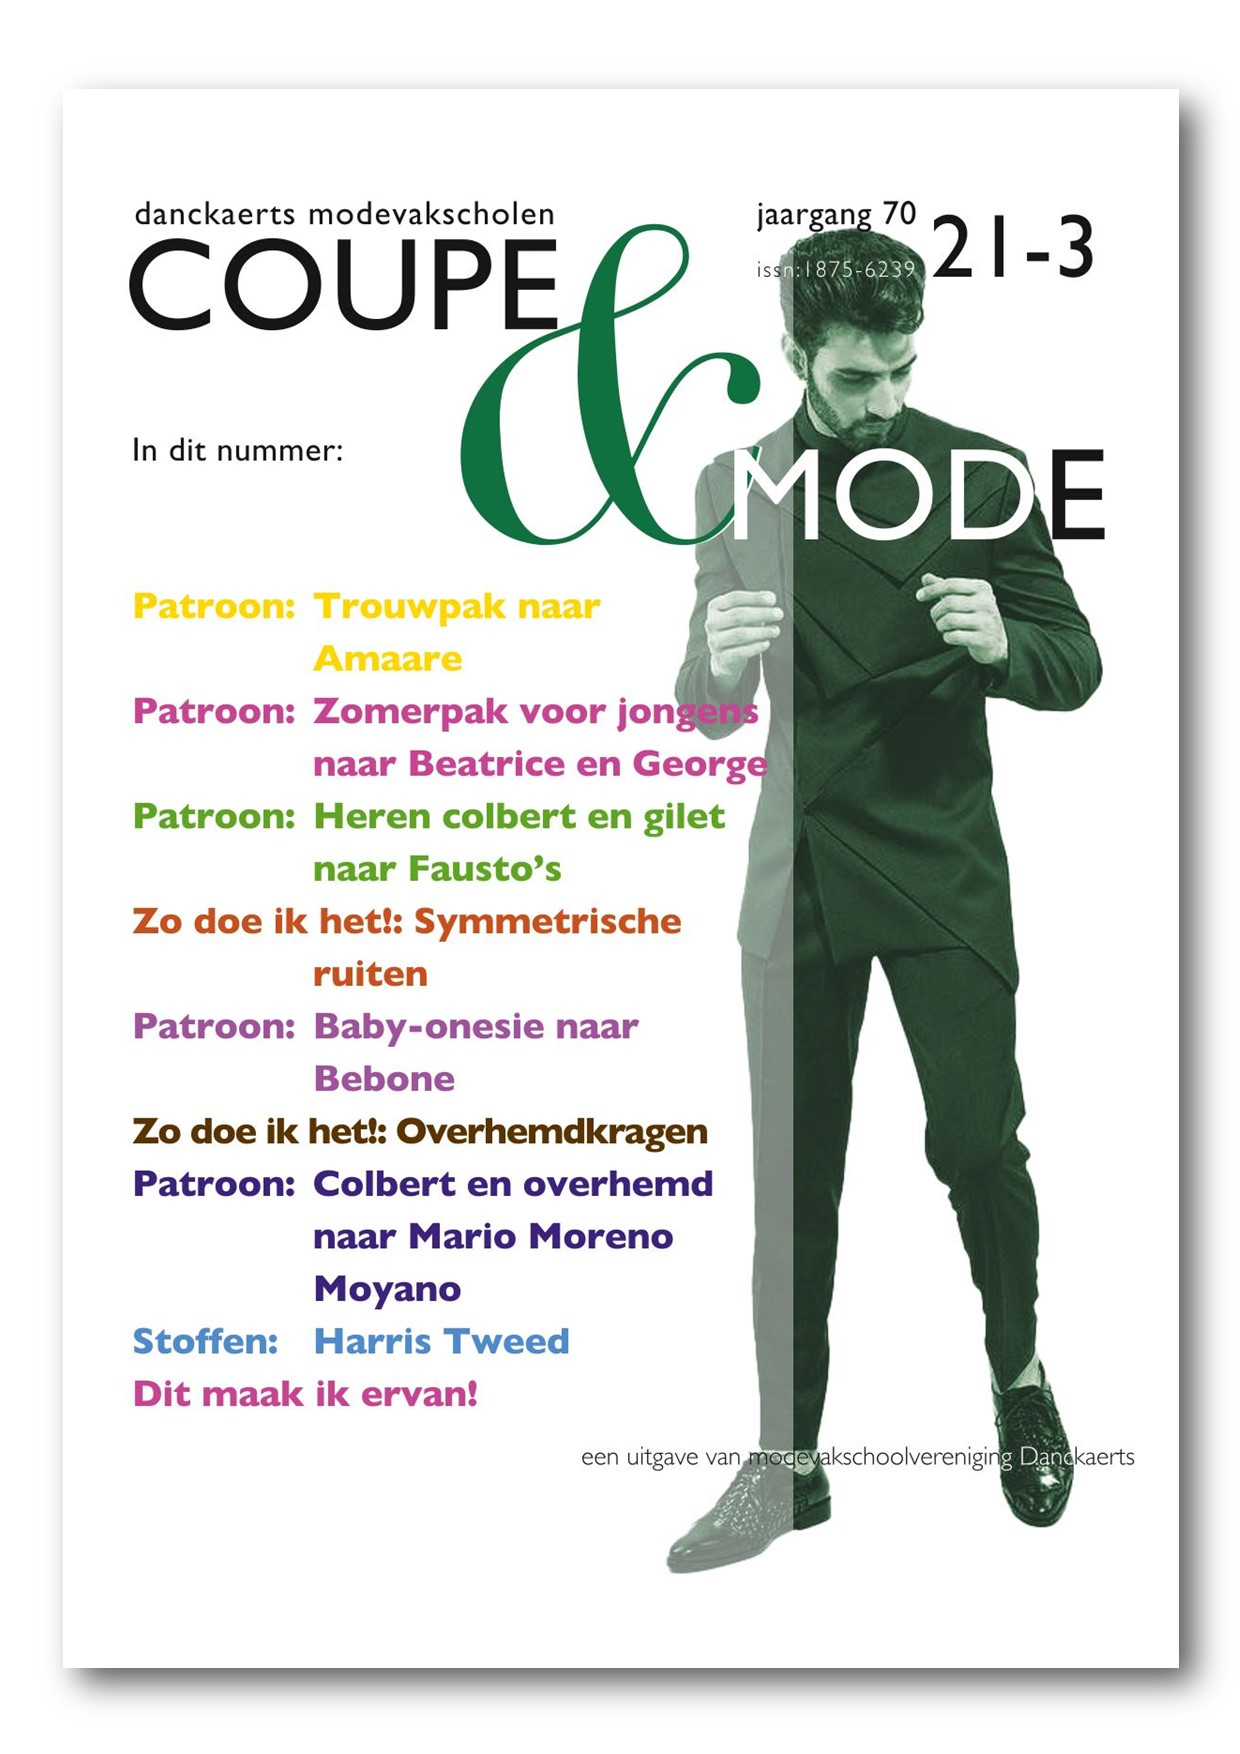 Coupe & Mode 70-21-03